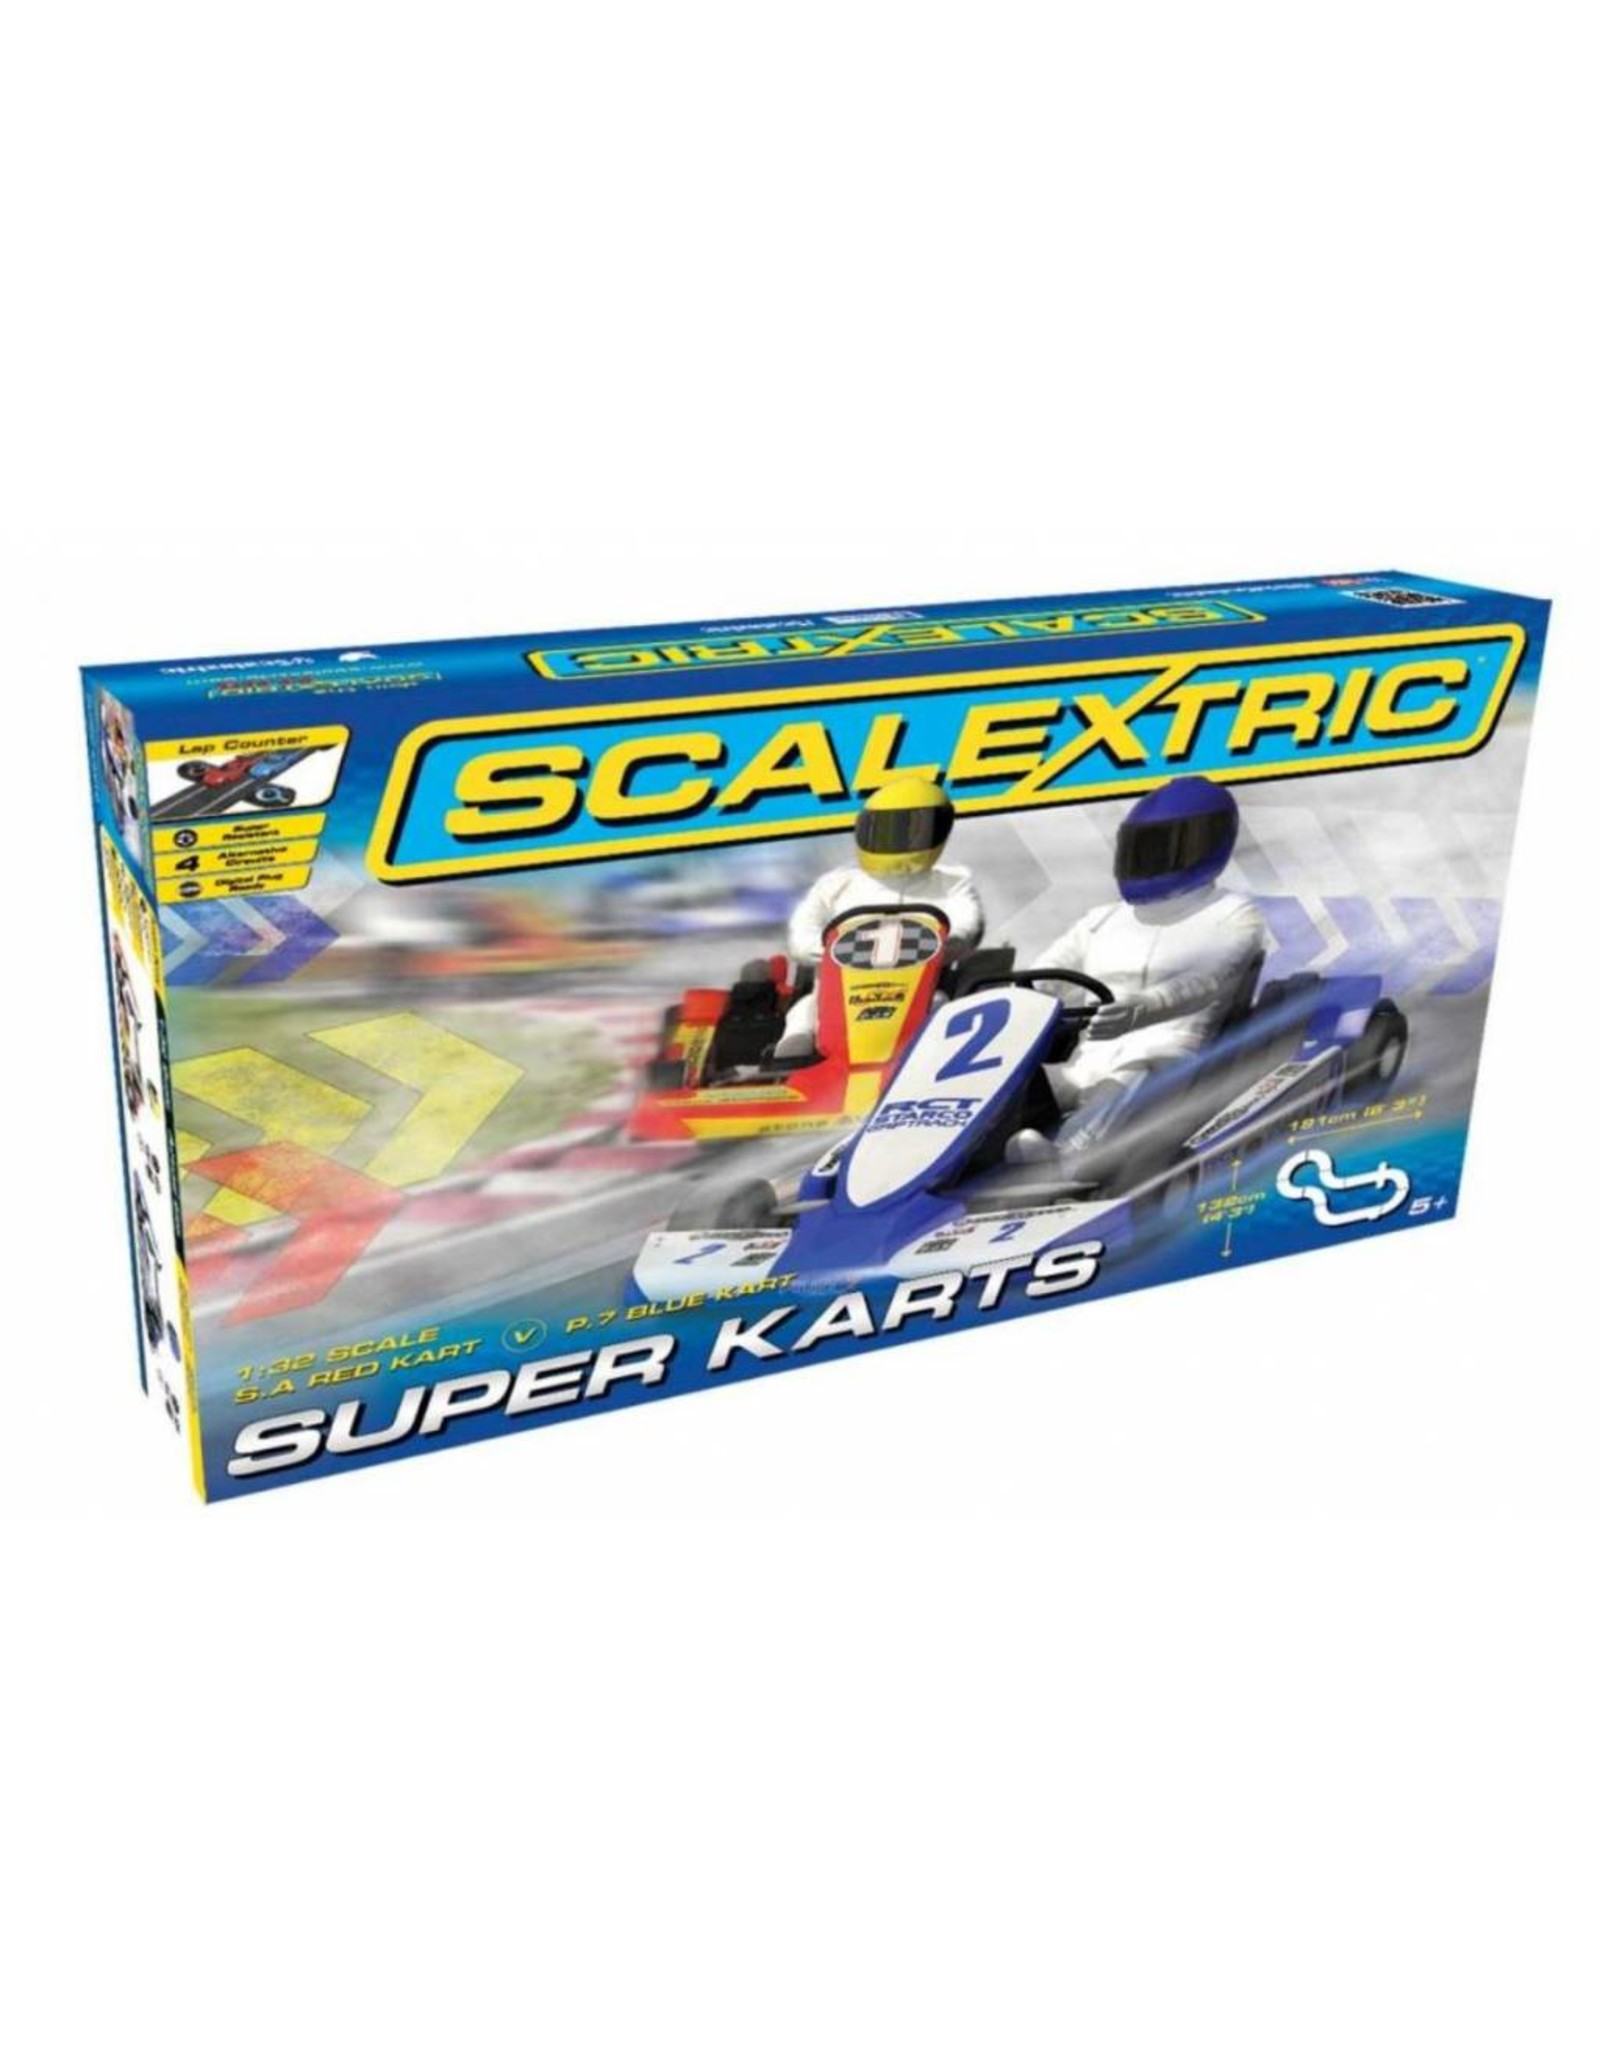 Super karts Scalextric Super Karts - 1:32-